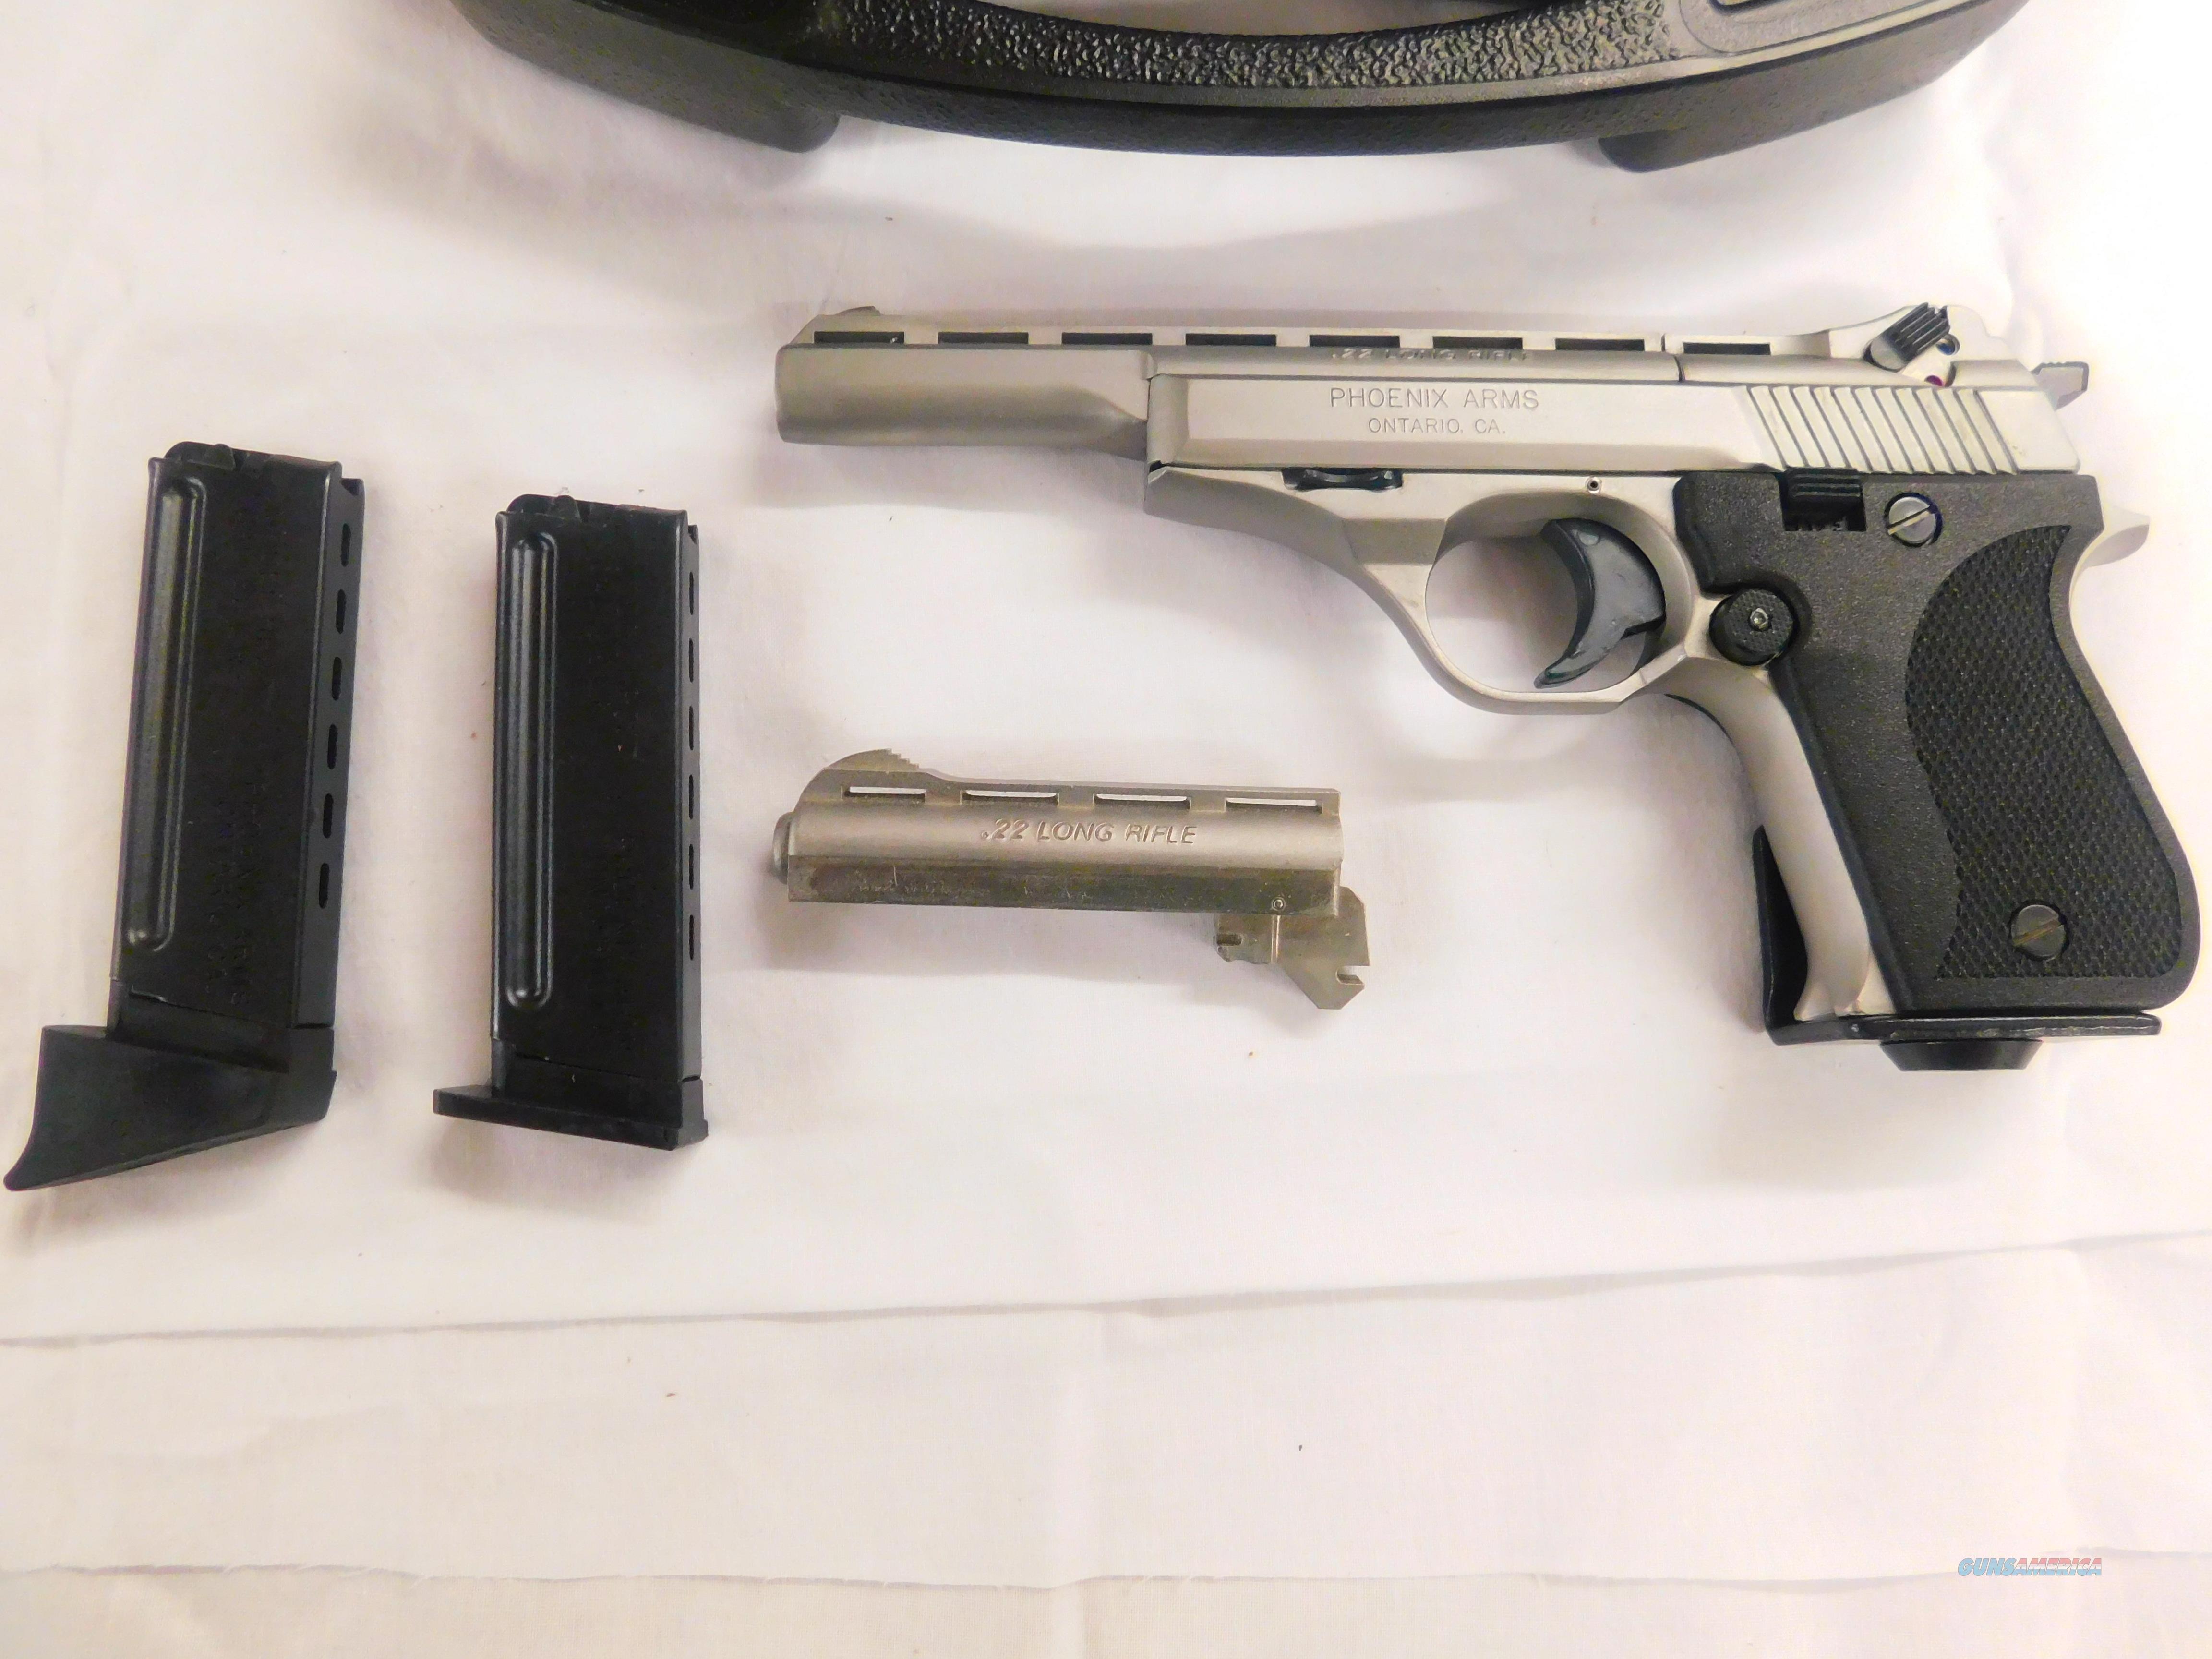 Phoenix Arms  HP Deluxe Range Kit 22 LR **Free Layaway**  Guns > Pistols > Phoenix Pistols